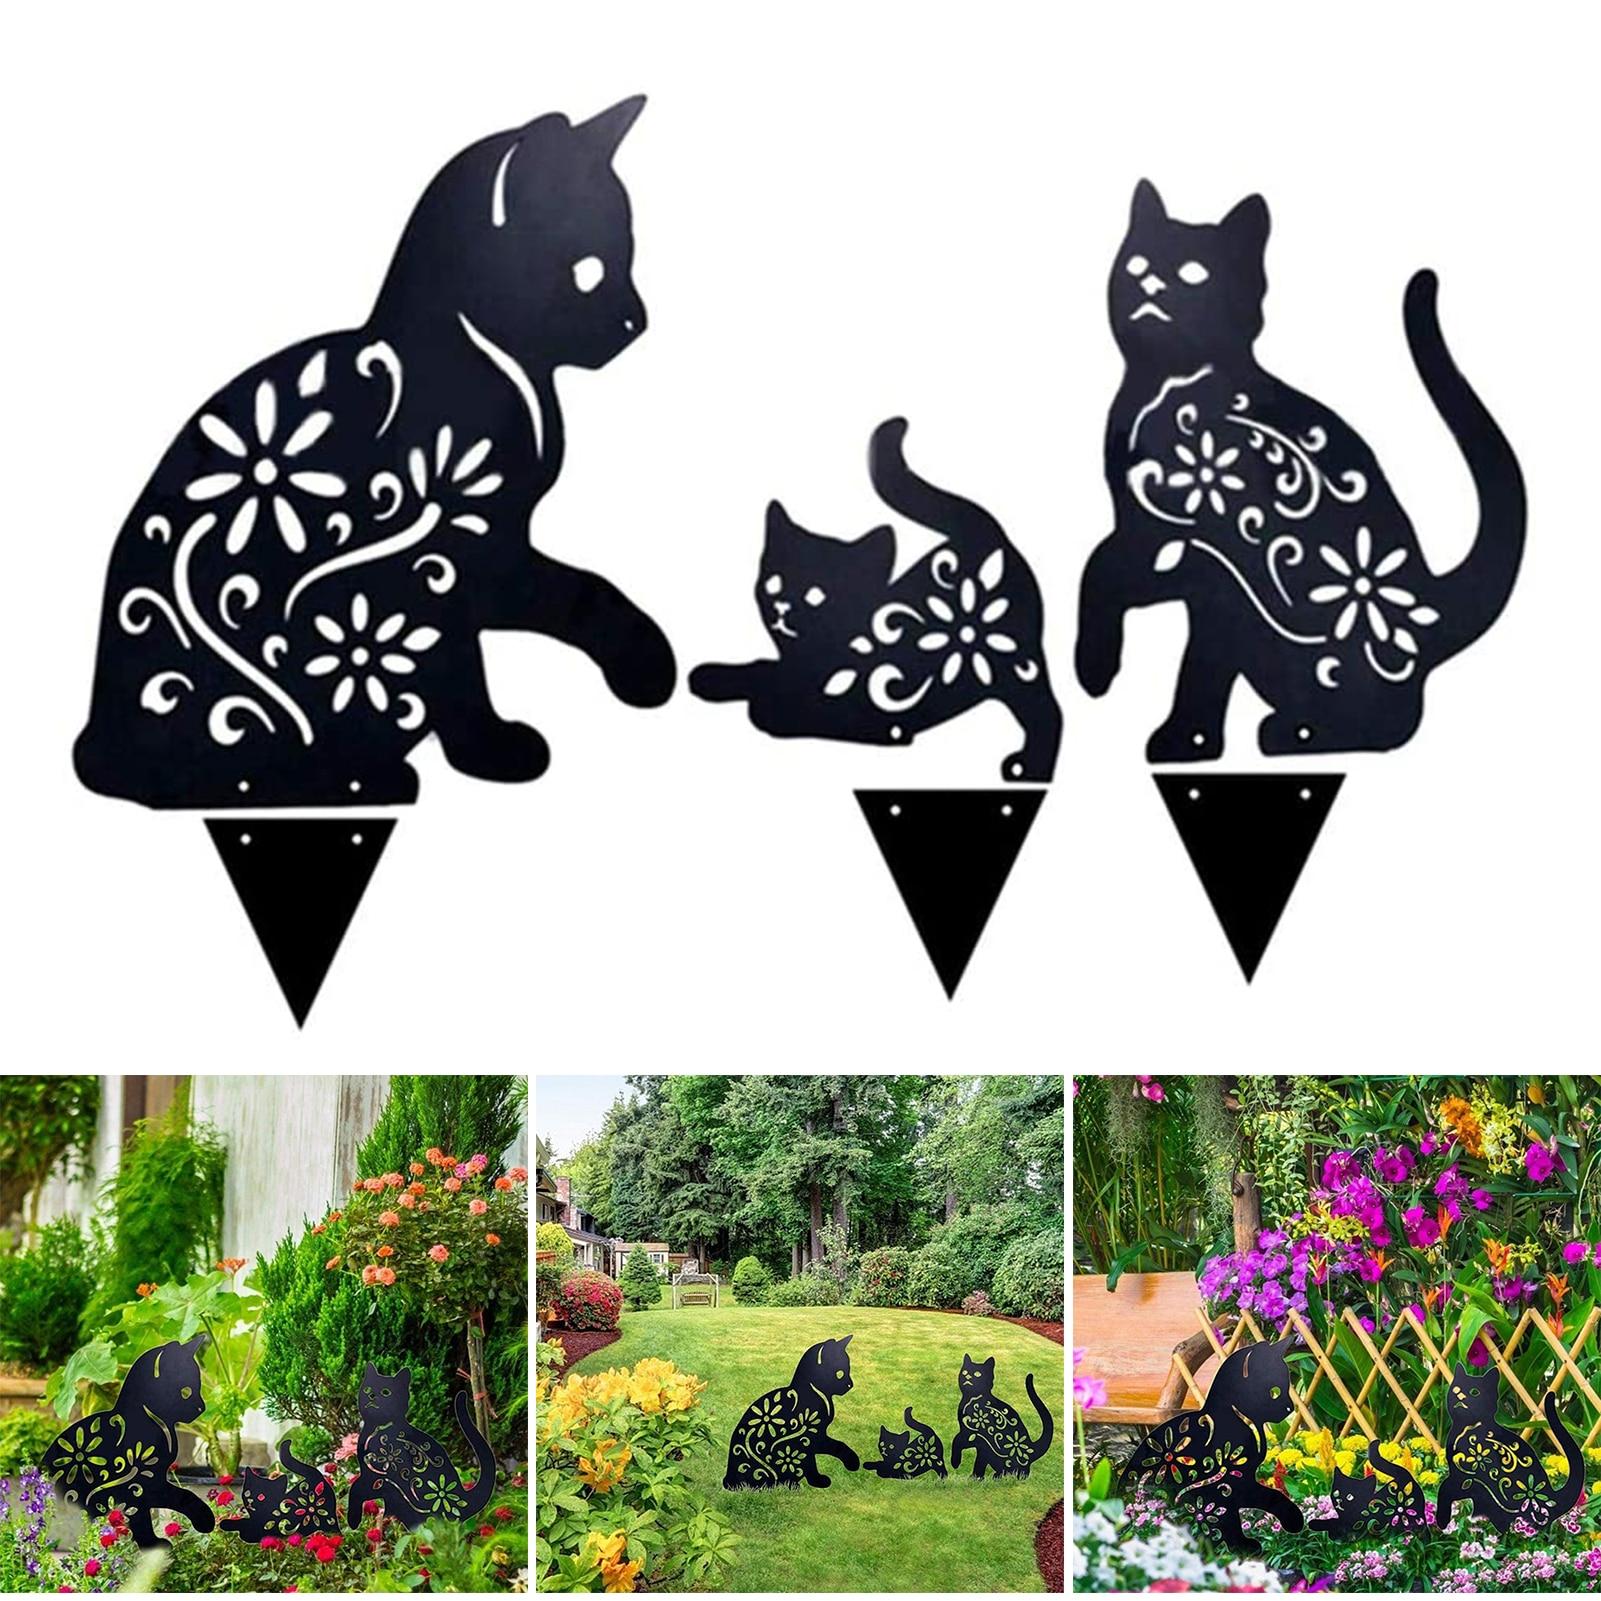 2D القط الشكل الأرضي إدراج ديكور الجوف نابض بالحياة هريرة المعادن تمثال الوتد للخارجية حديقة مانور الحديقة الأسود S7